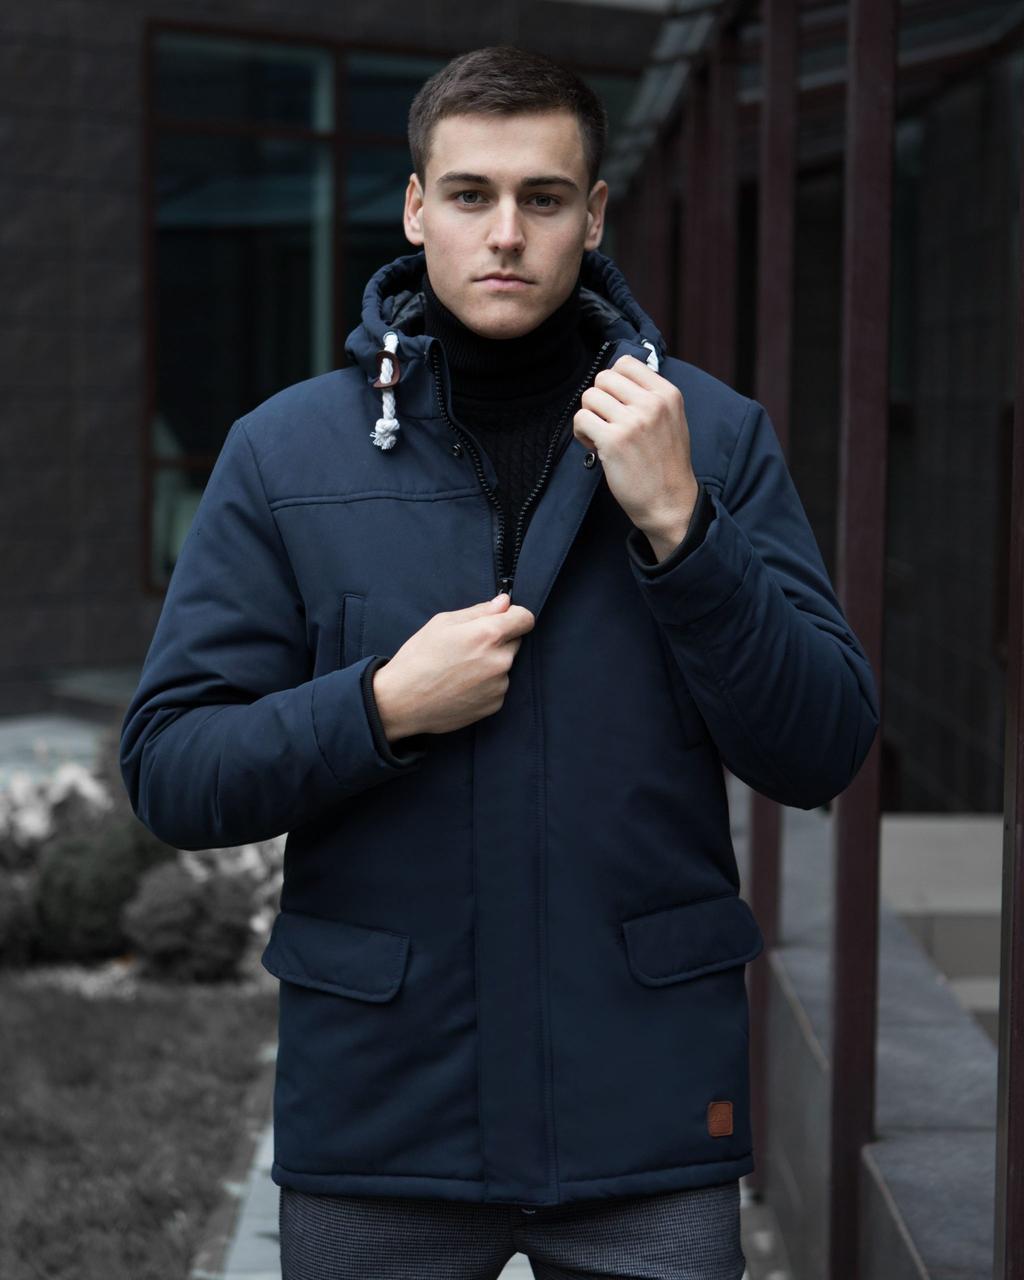 Куртка Парка зимняя мужская ELIT Pobedov (темно-синяя)